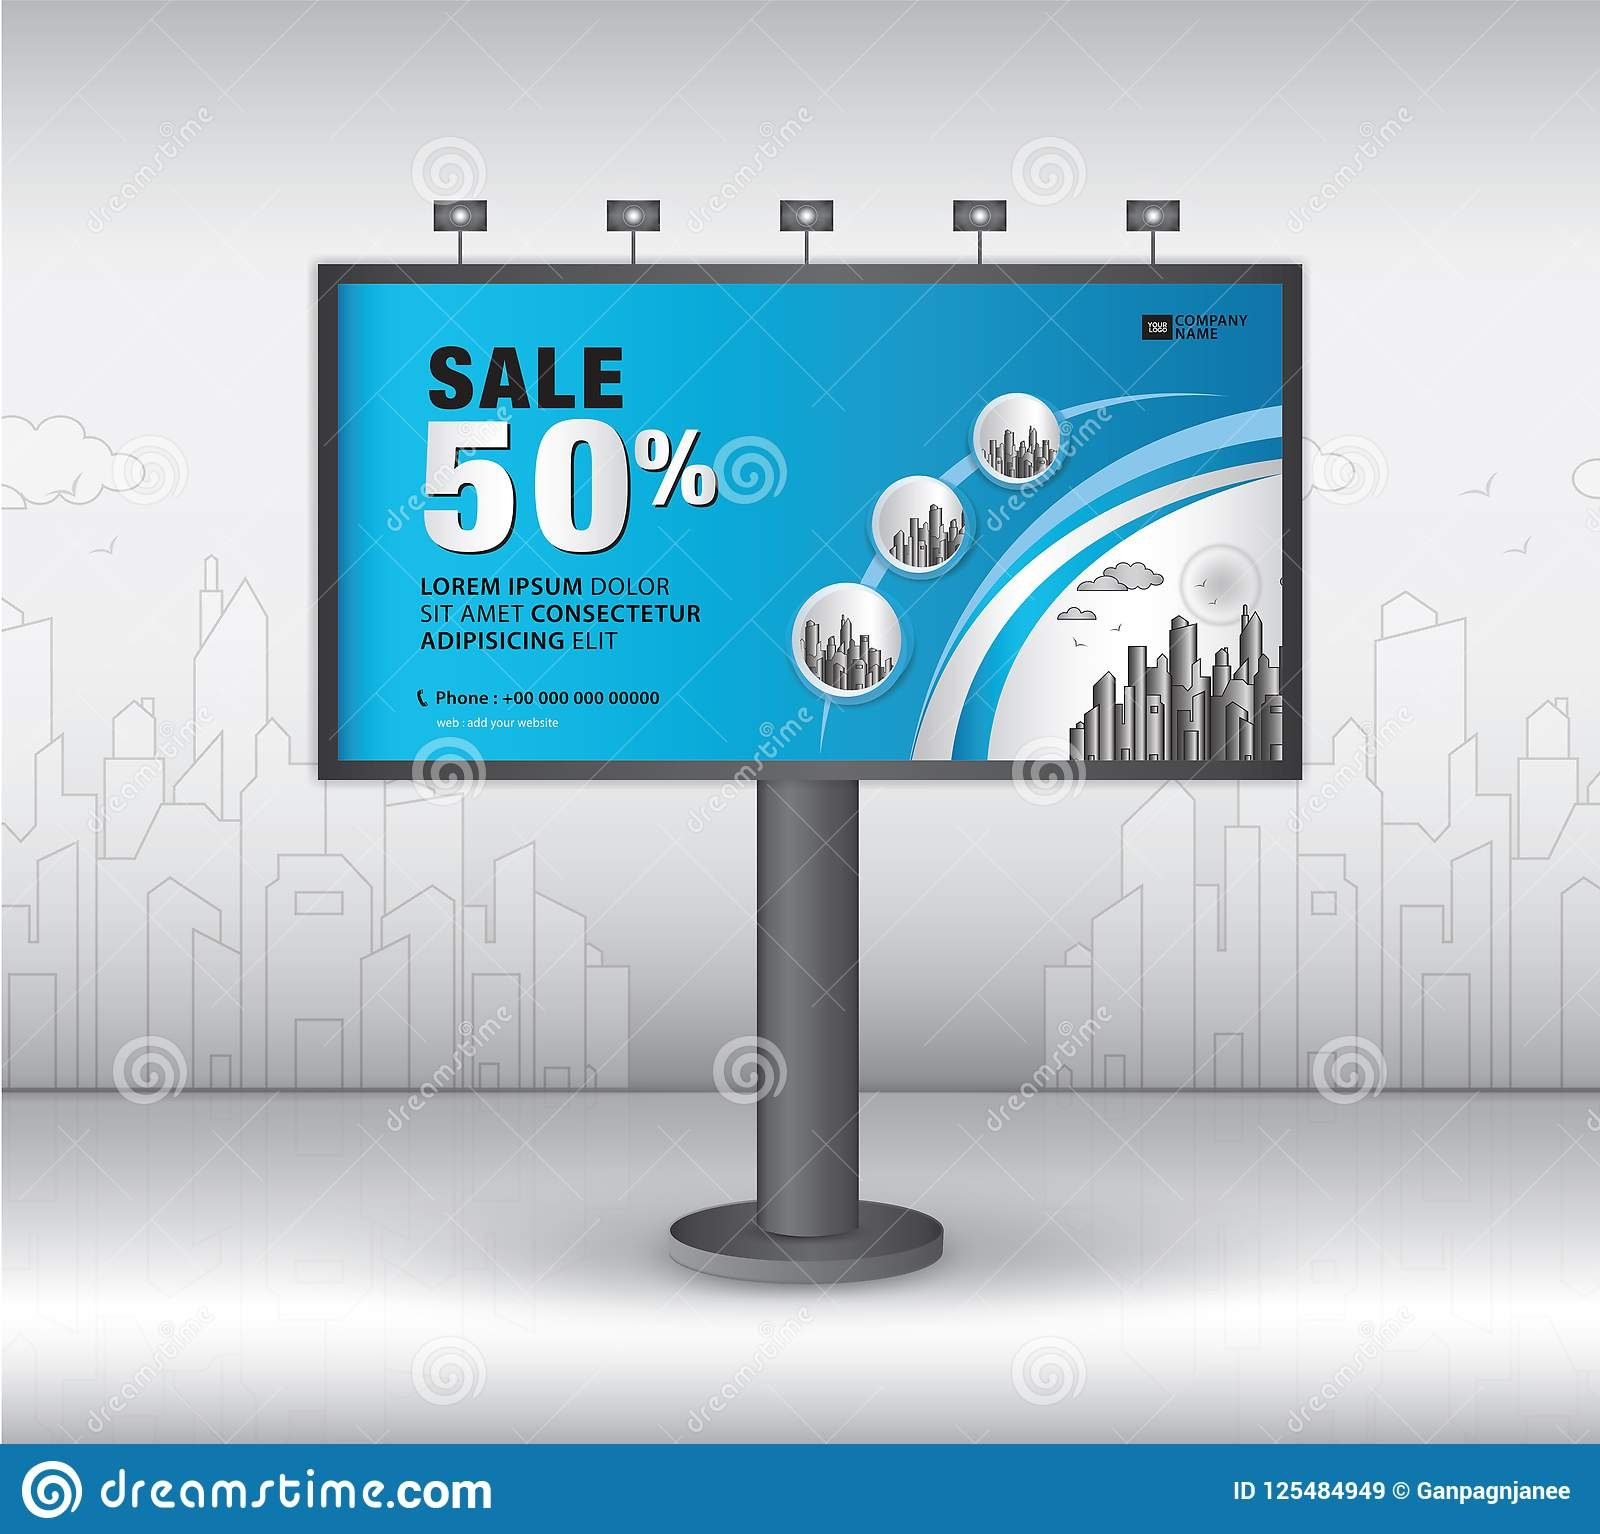 Billboard Banner Template Vector Design Advertisement Realistic Throughout Outdoor Banner Template